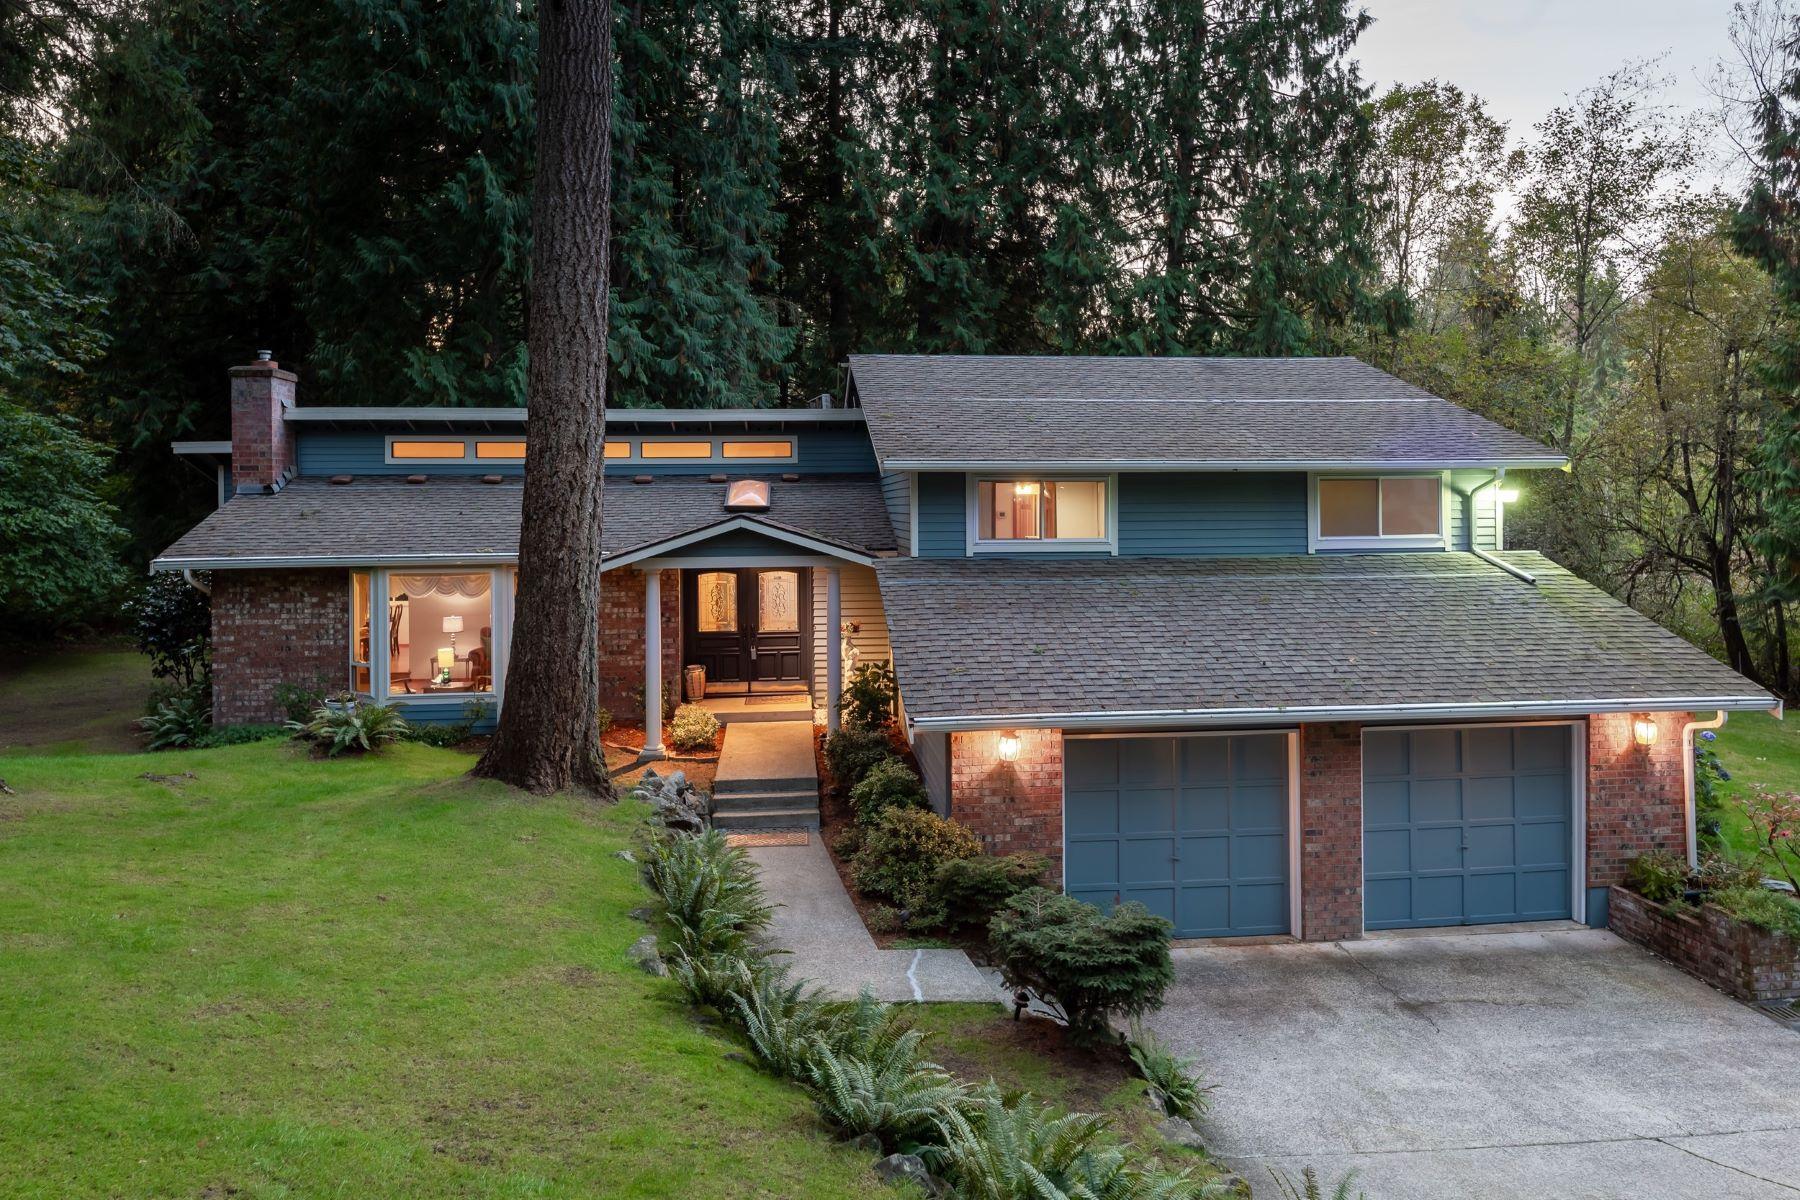 Single Family Homes for Sale at Pine Lake Oasis 3733 221st Ave SE Sammamish, Washington 98075 United States